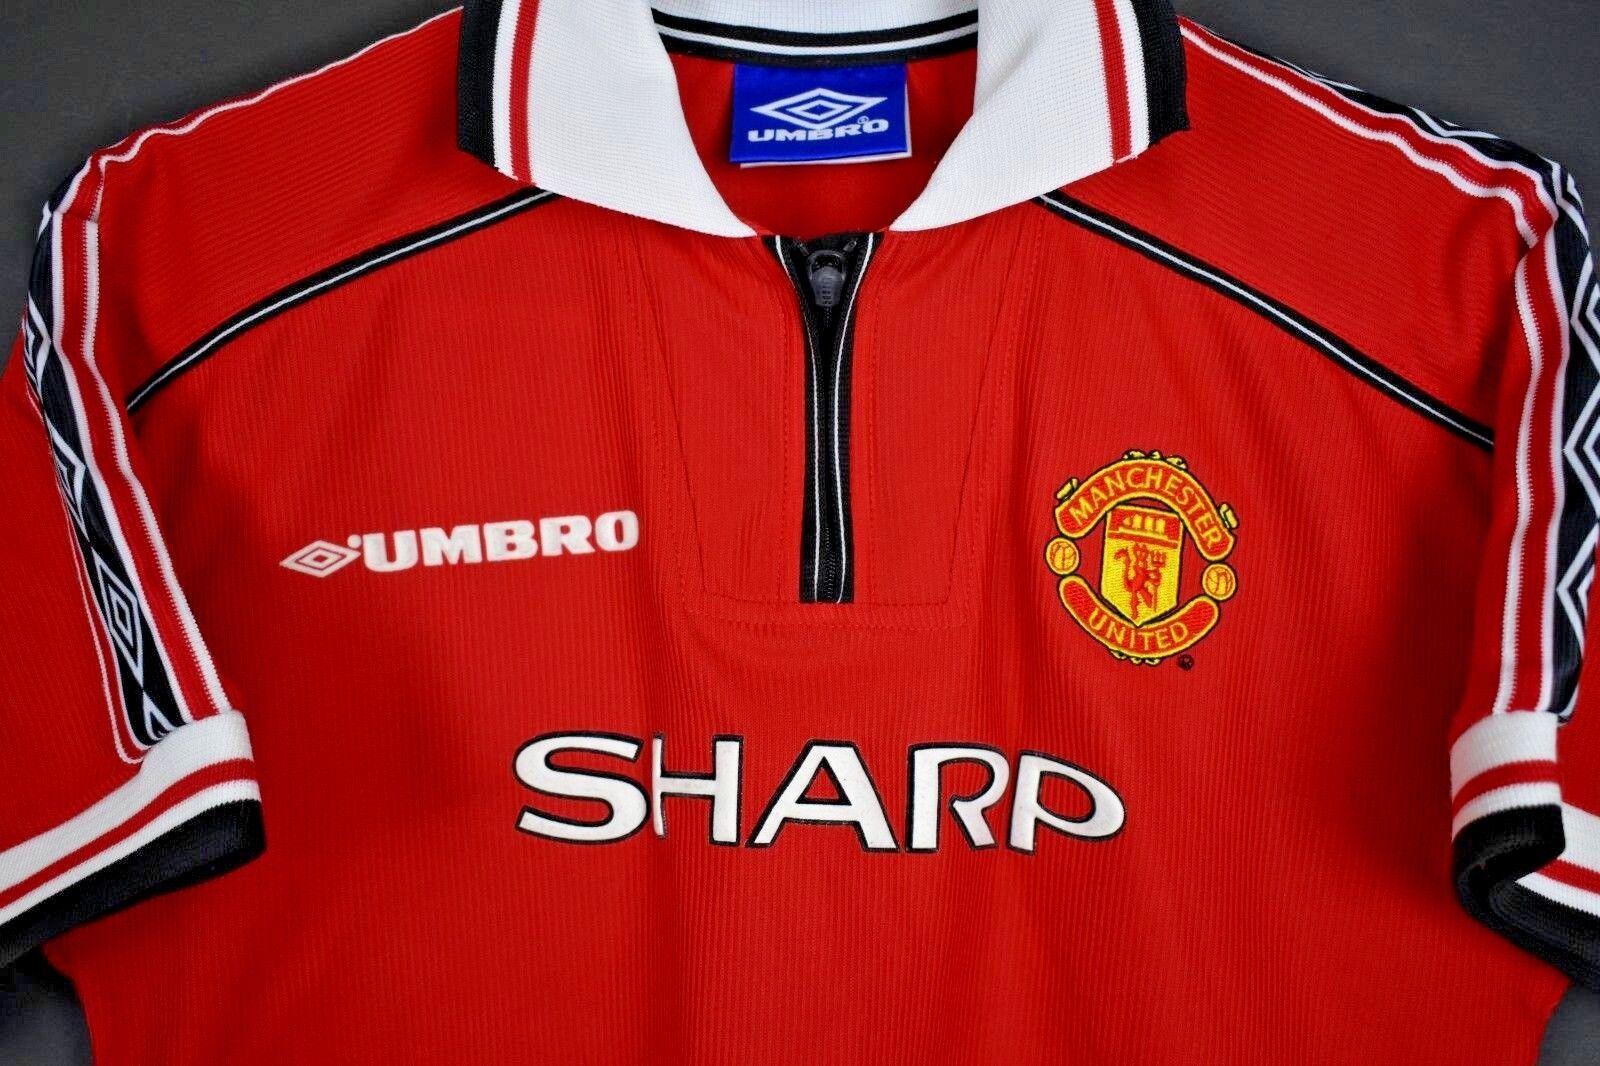 Manchester United Umbro shirt 1999 treble football soccer jersey XXSkids large